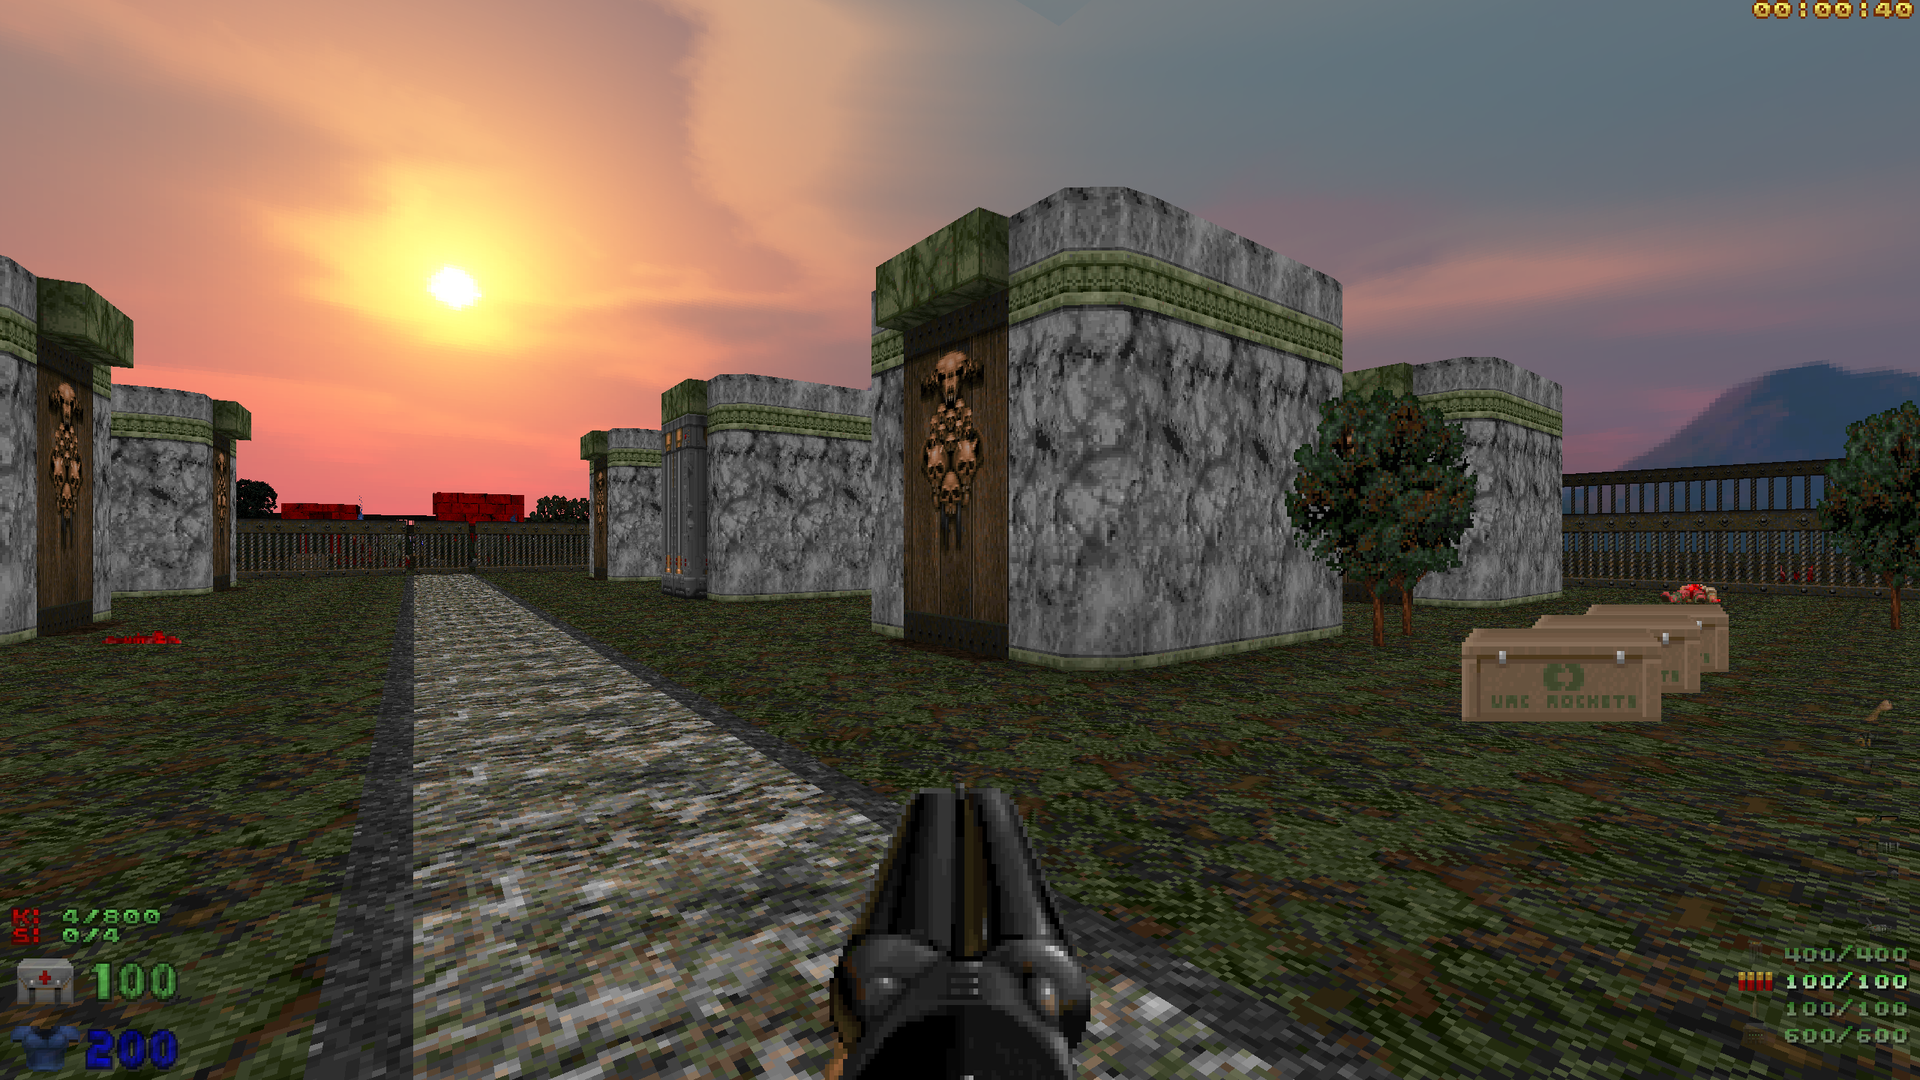 Screenshot_Doom_20210303_105726.png.f1e8d0bead9b79e12fd280c14885ca6e.png